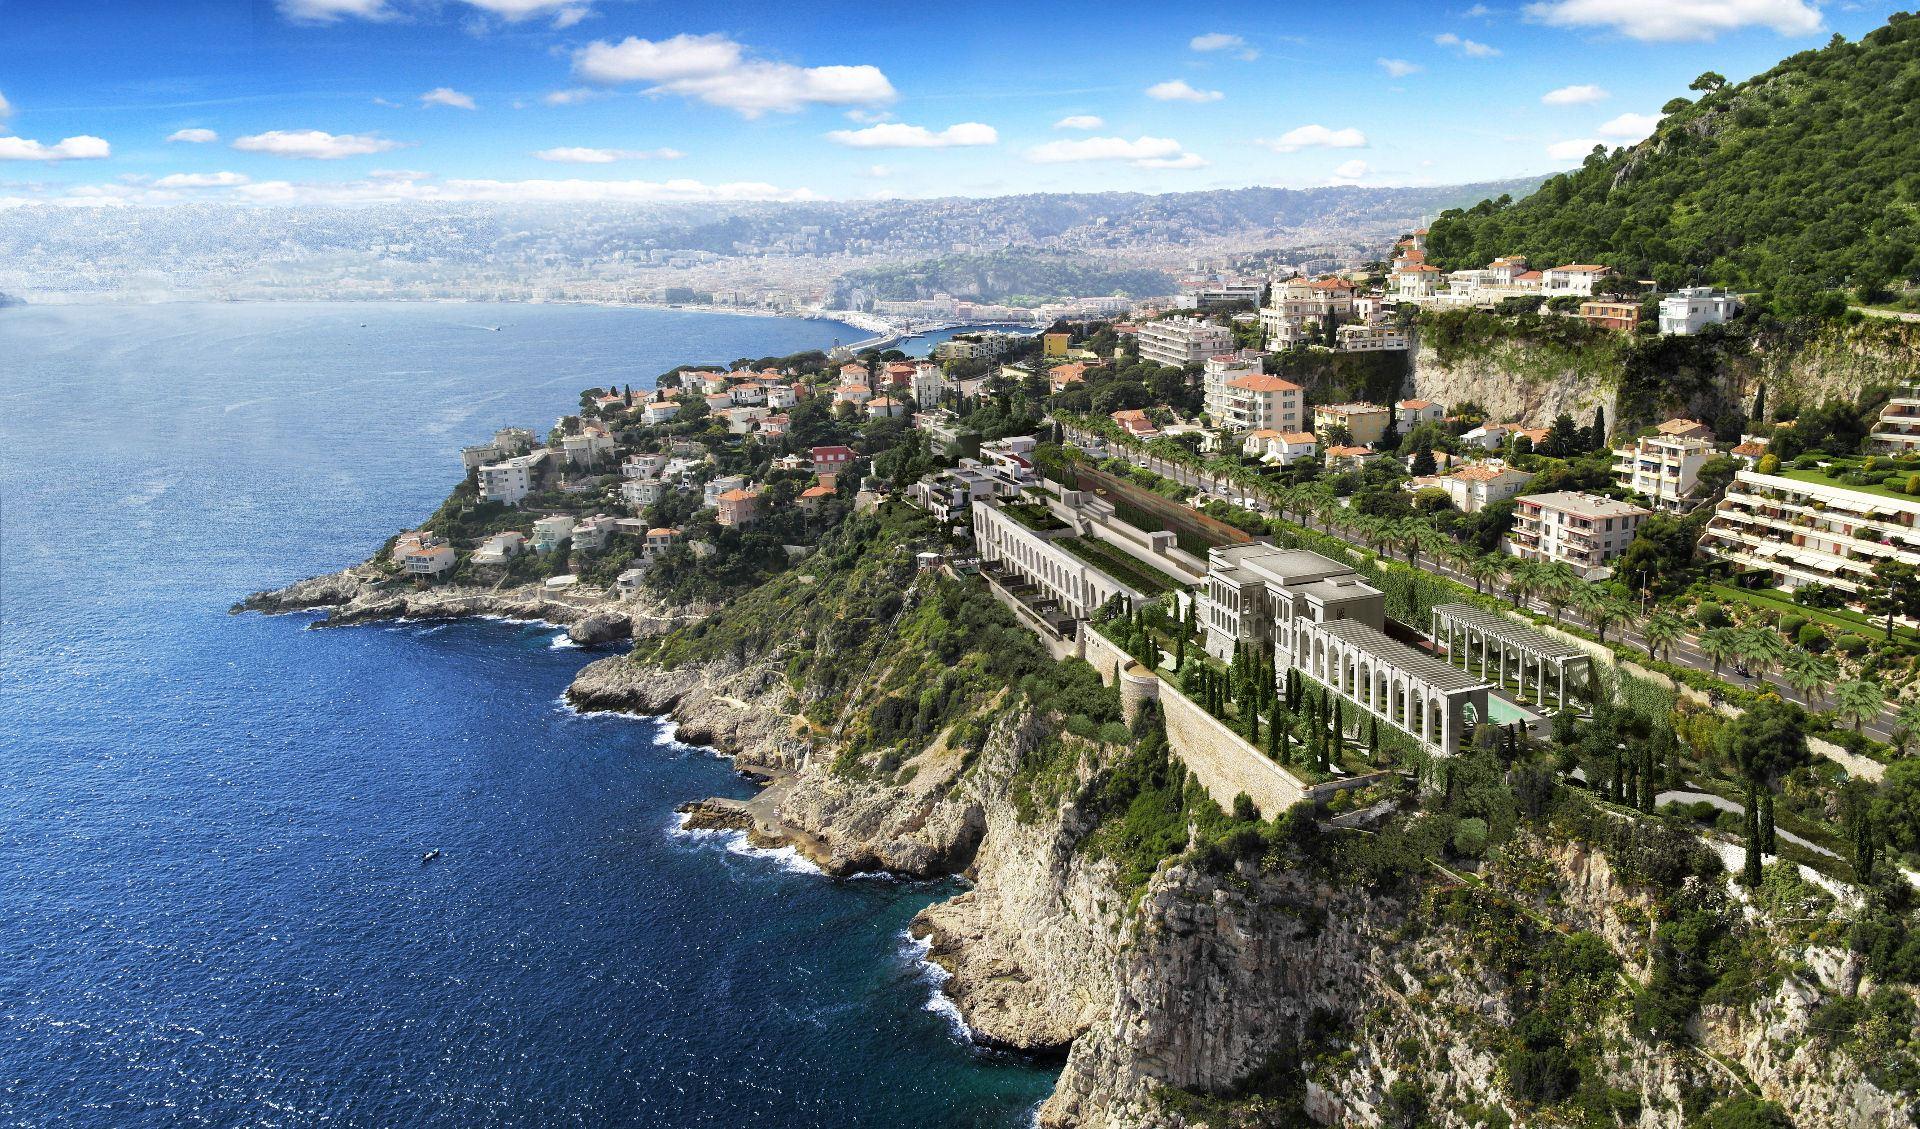 Property for Sale at For sale - Private estate facing the sea - Cap de Nice - Palais Maeterlinck Nice, Provence-Alpes-Cote D'Azur 06300 France